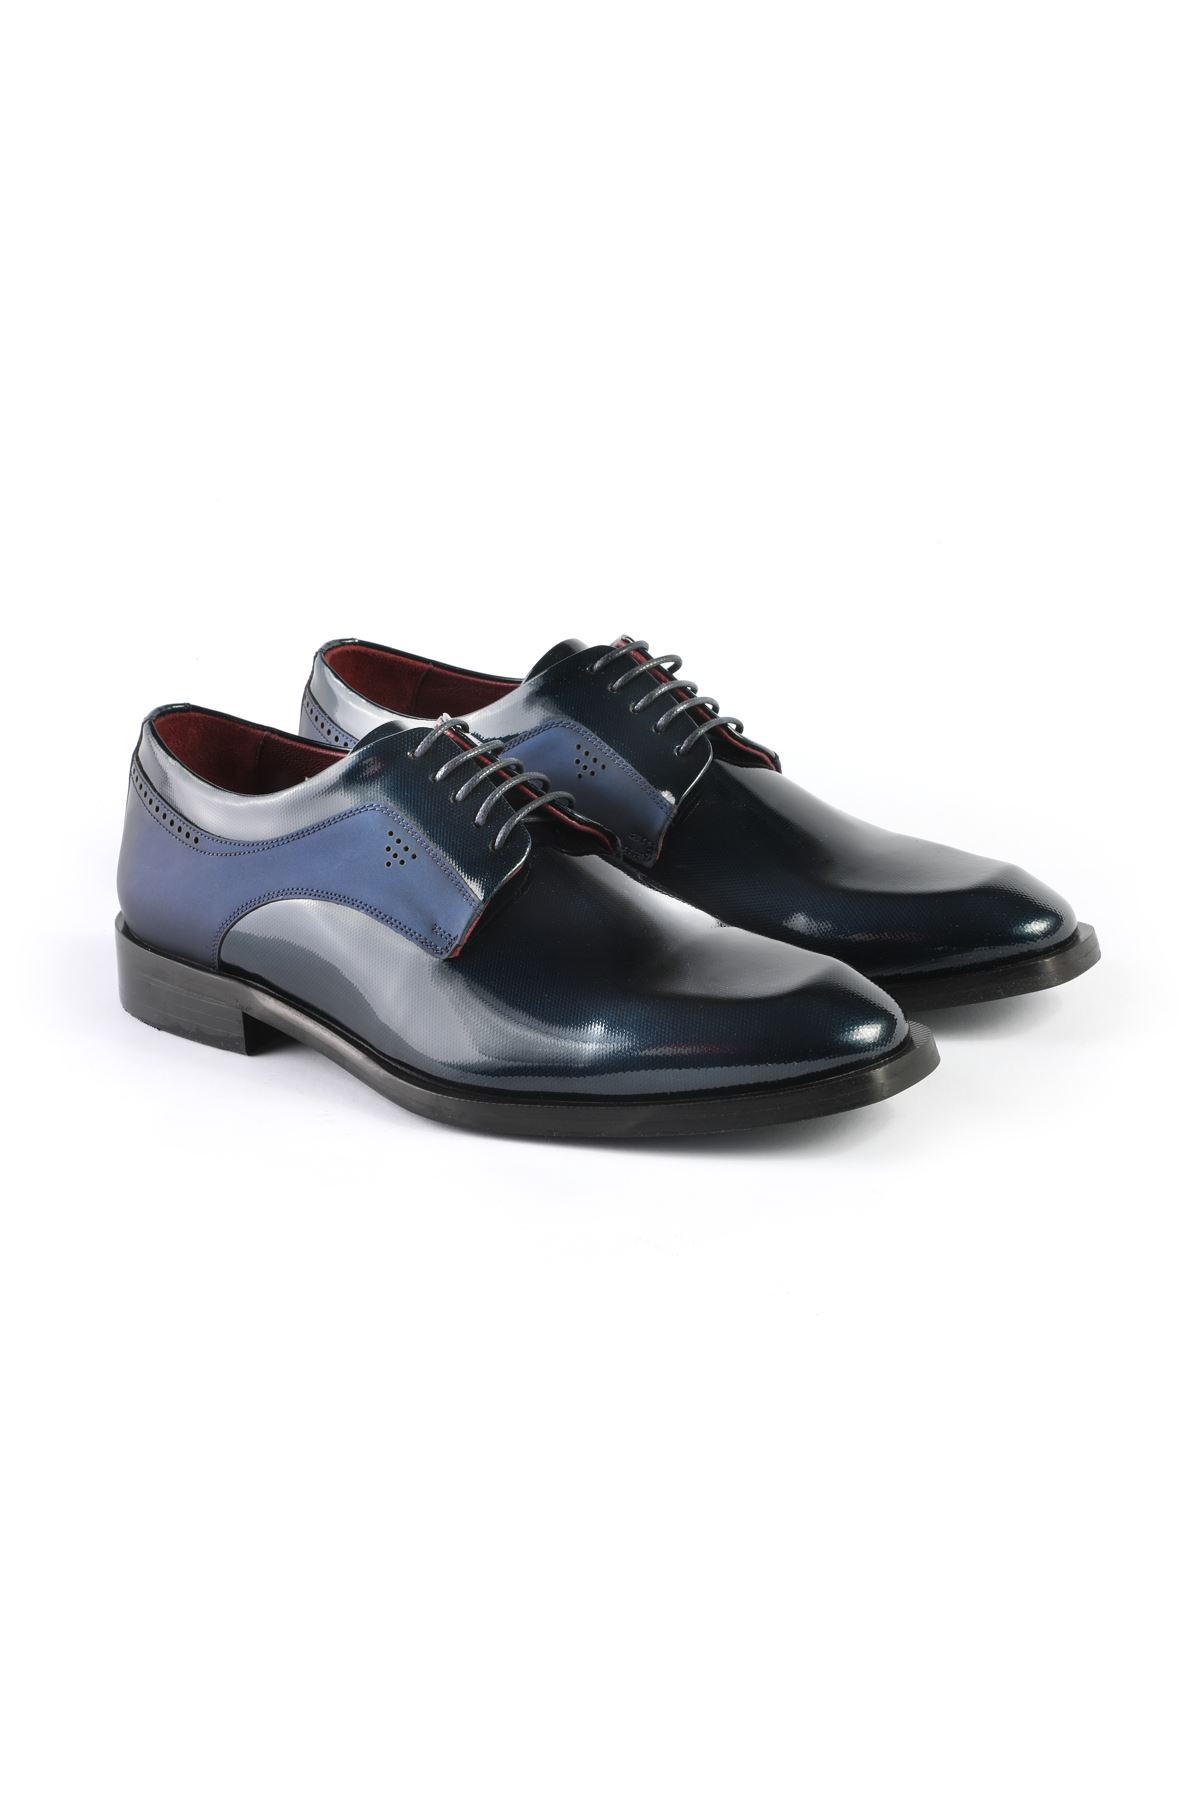 Libero L3252 Navy Blue Classic Shoes